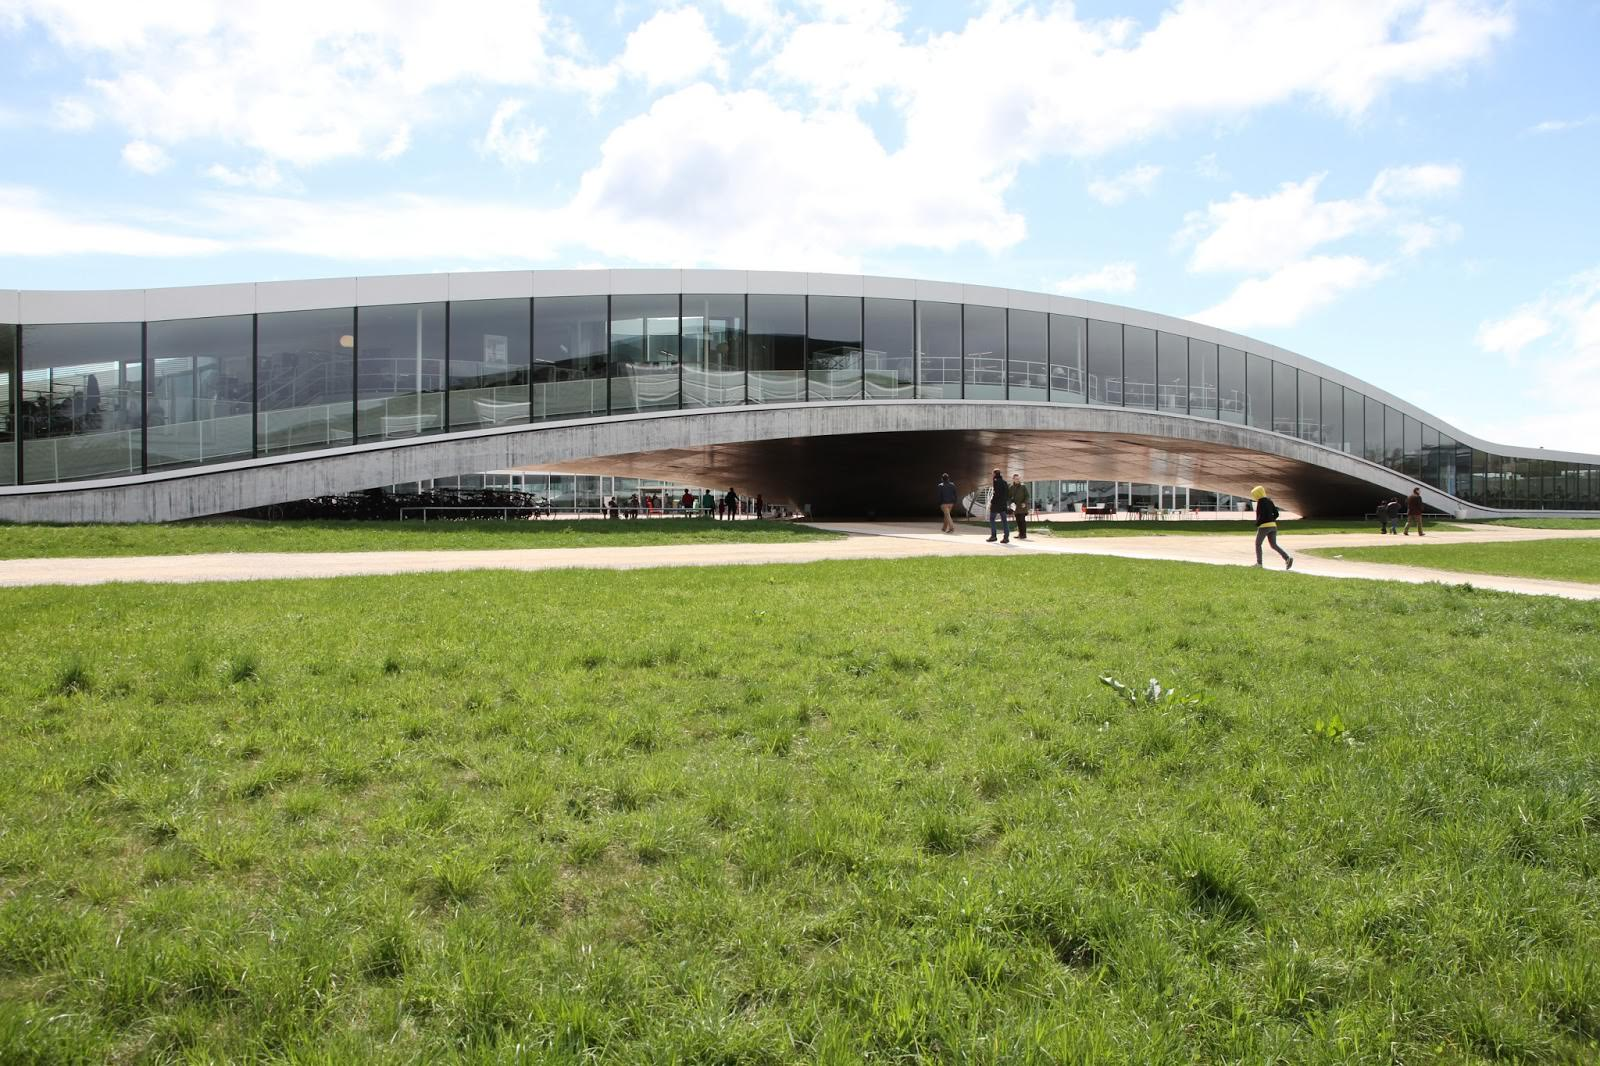 Documentari sull'architettura